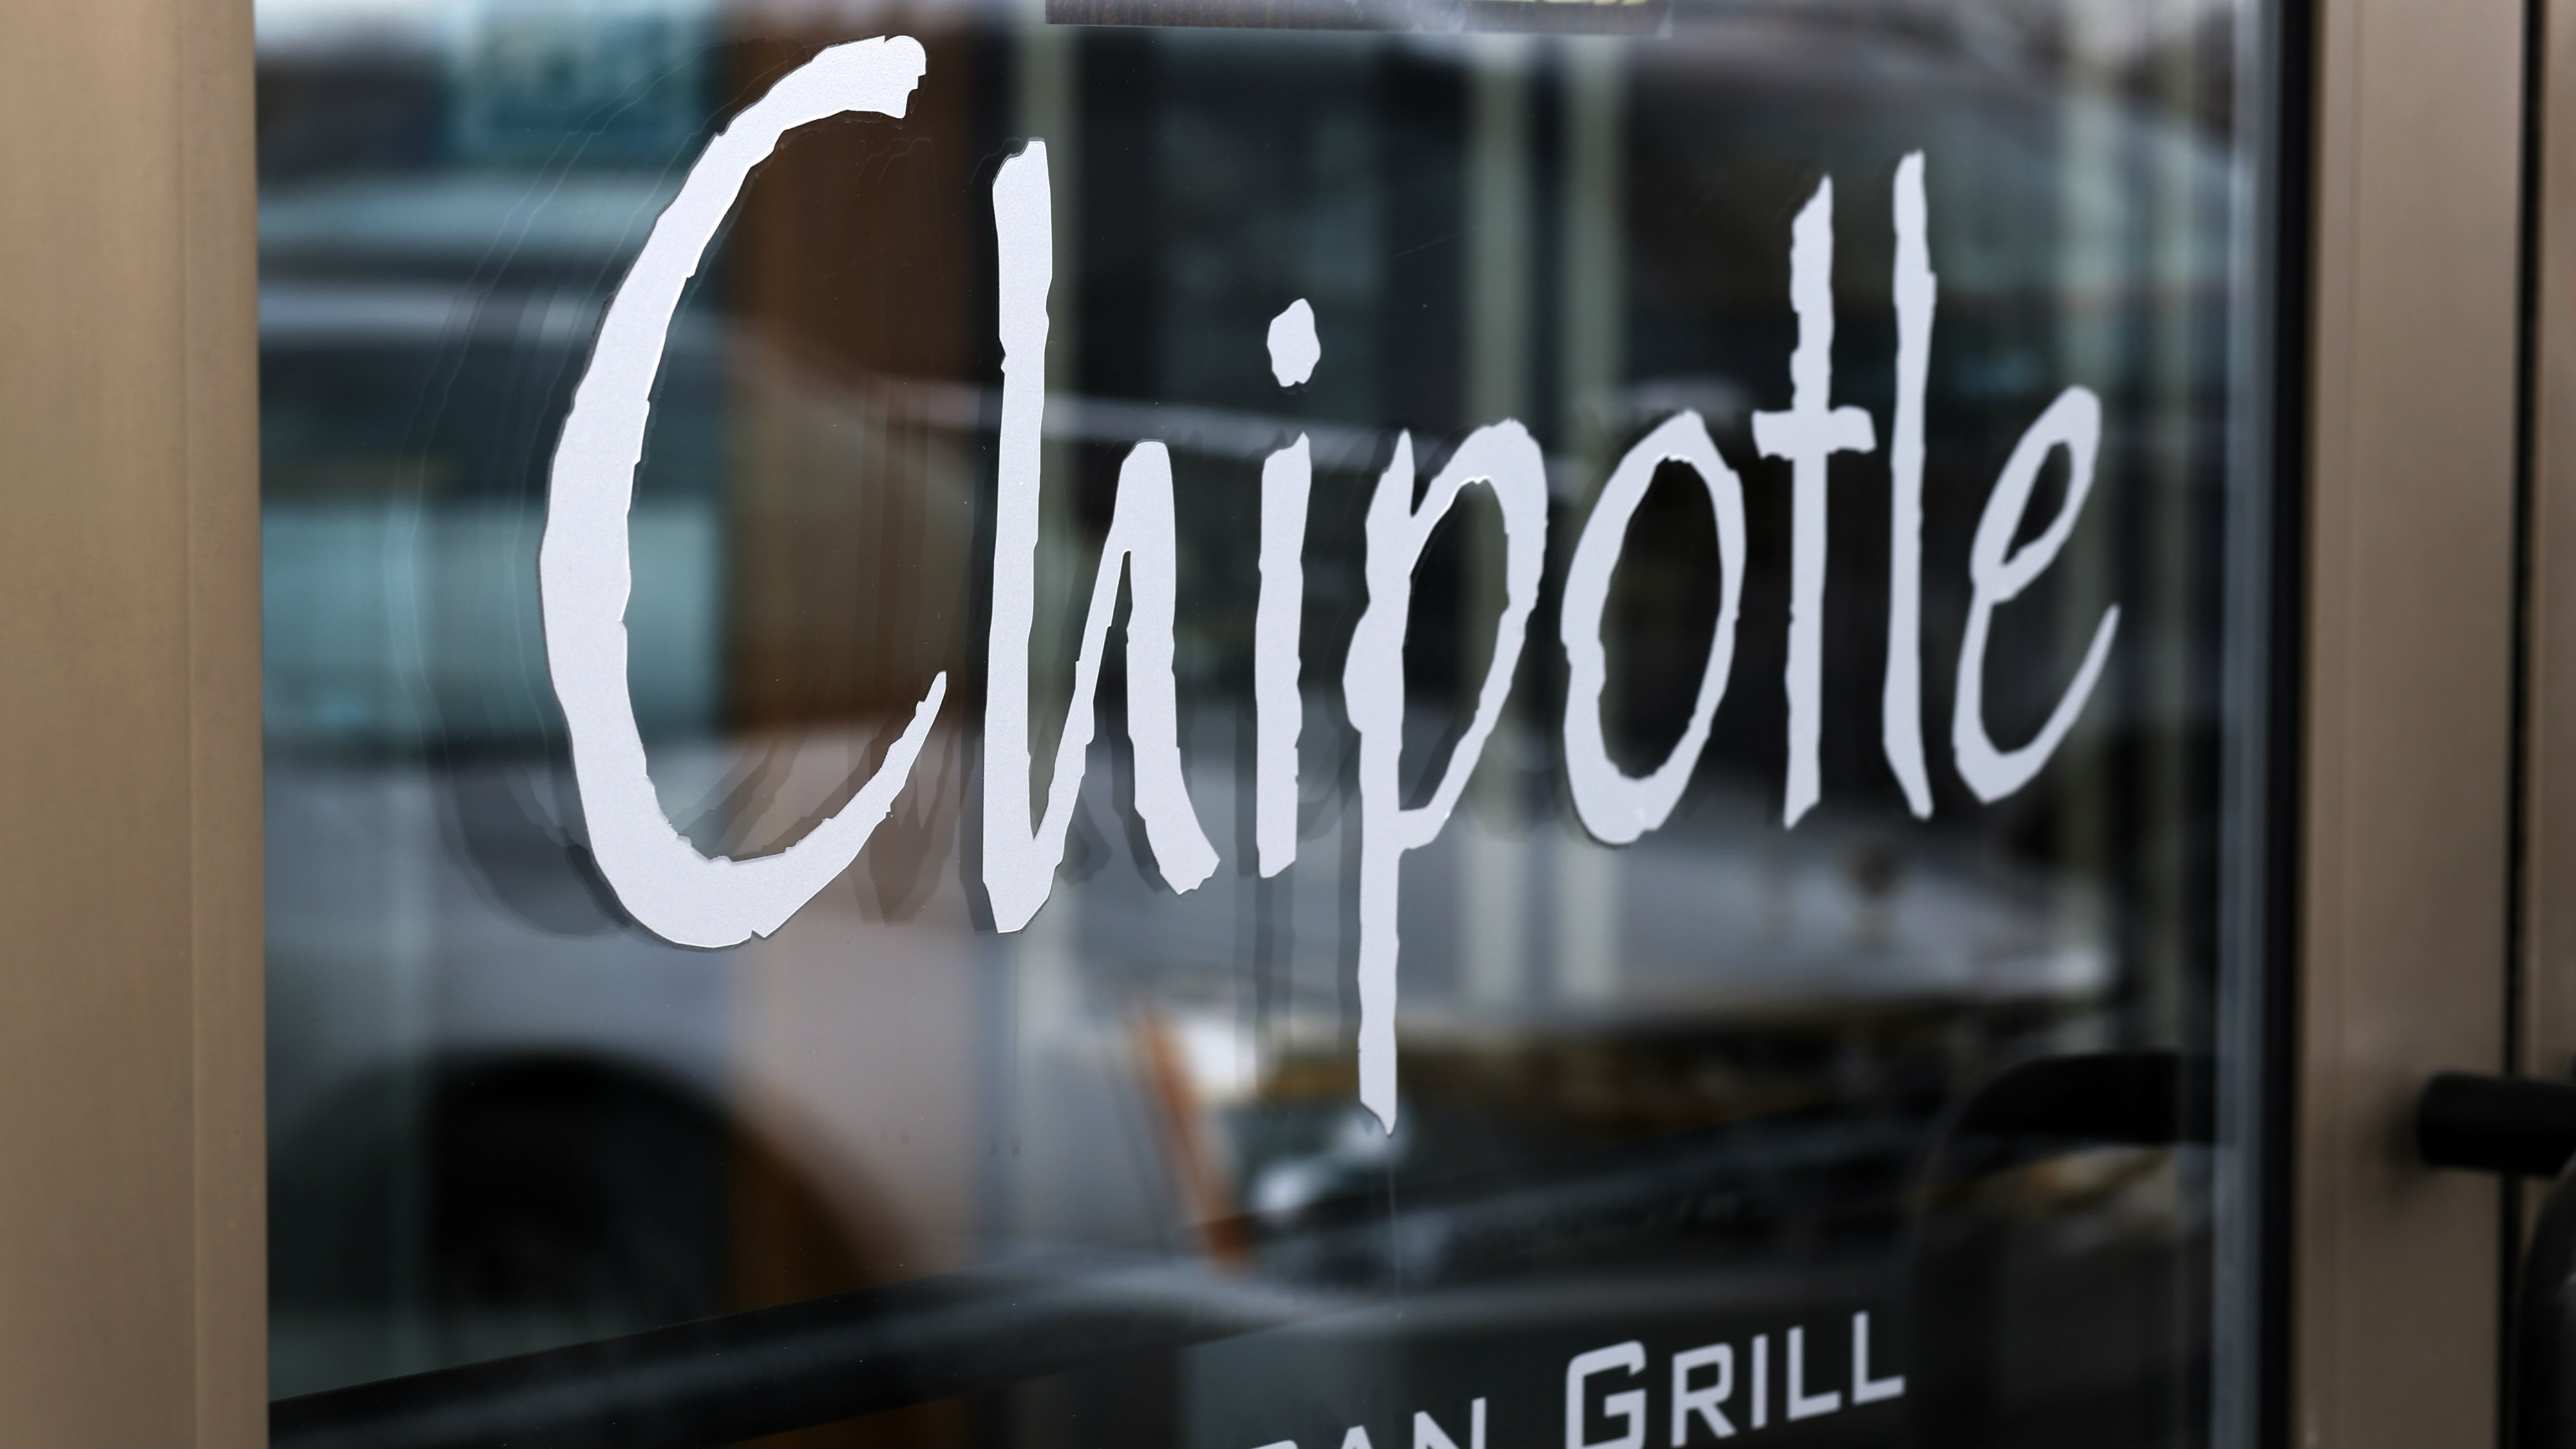 chipotle-delivery-burritos 2